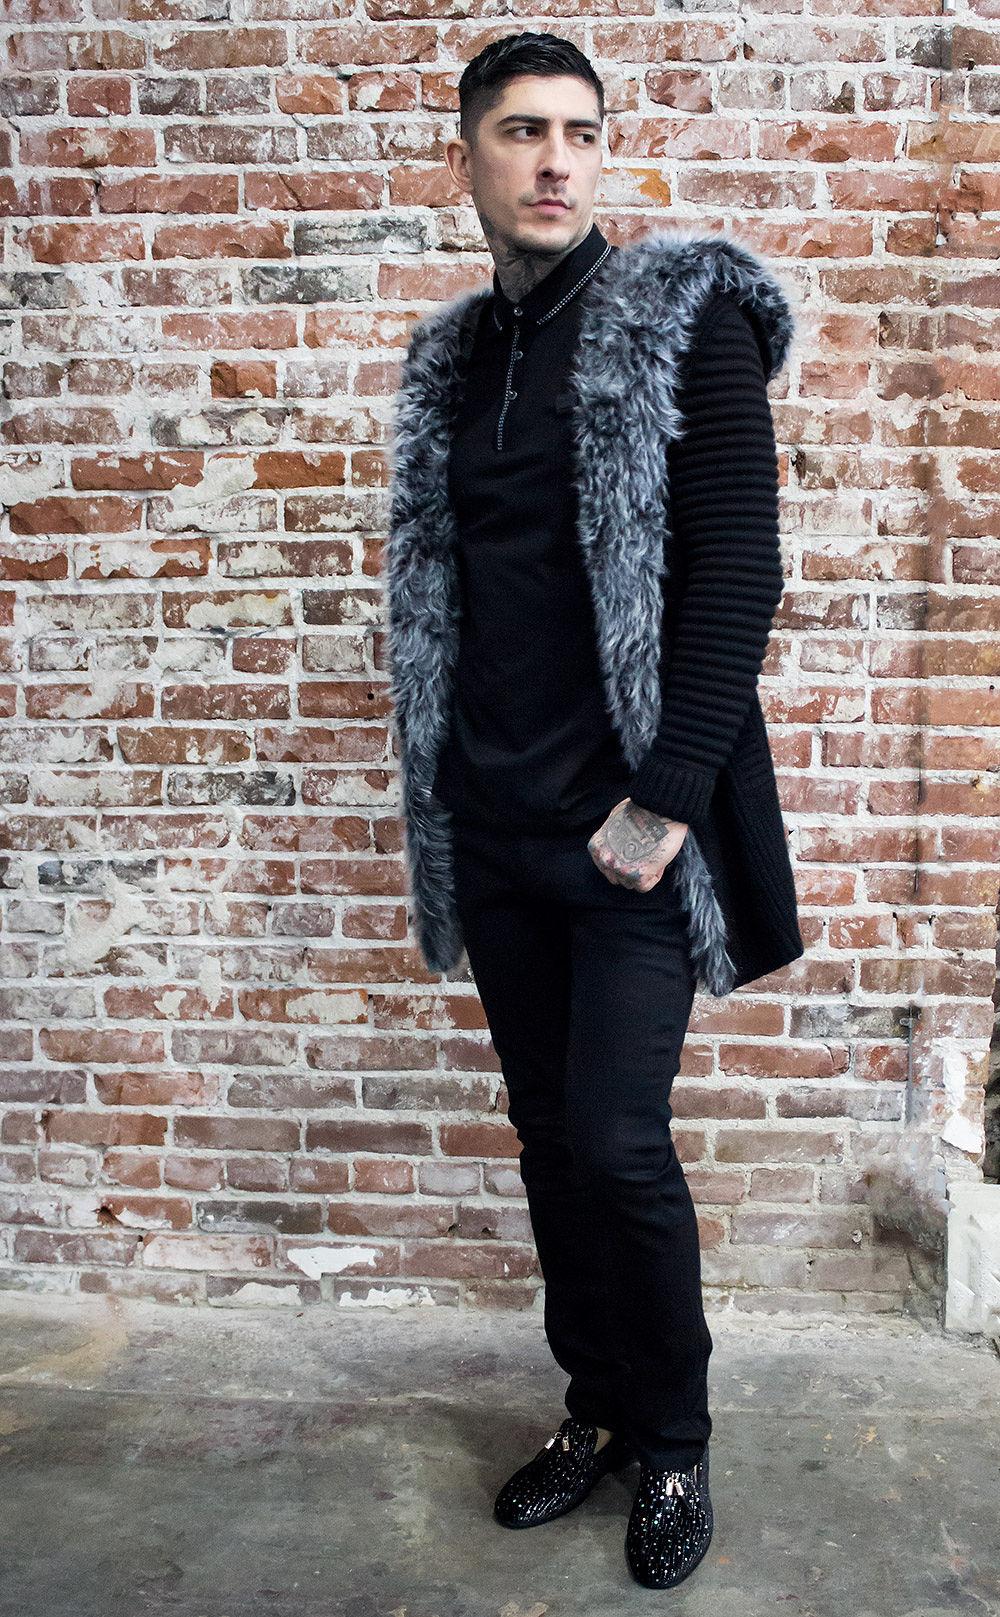 black hooded sweat shirt